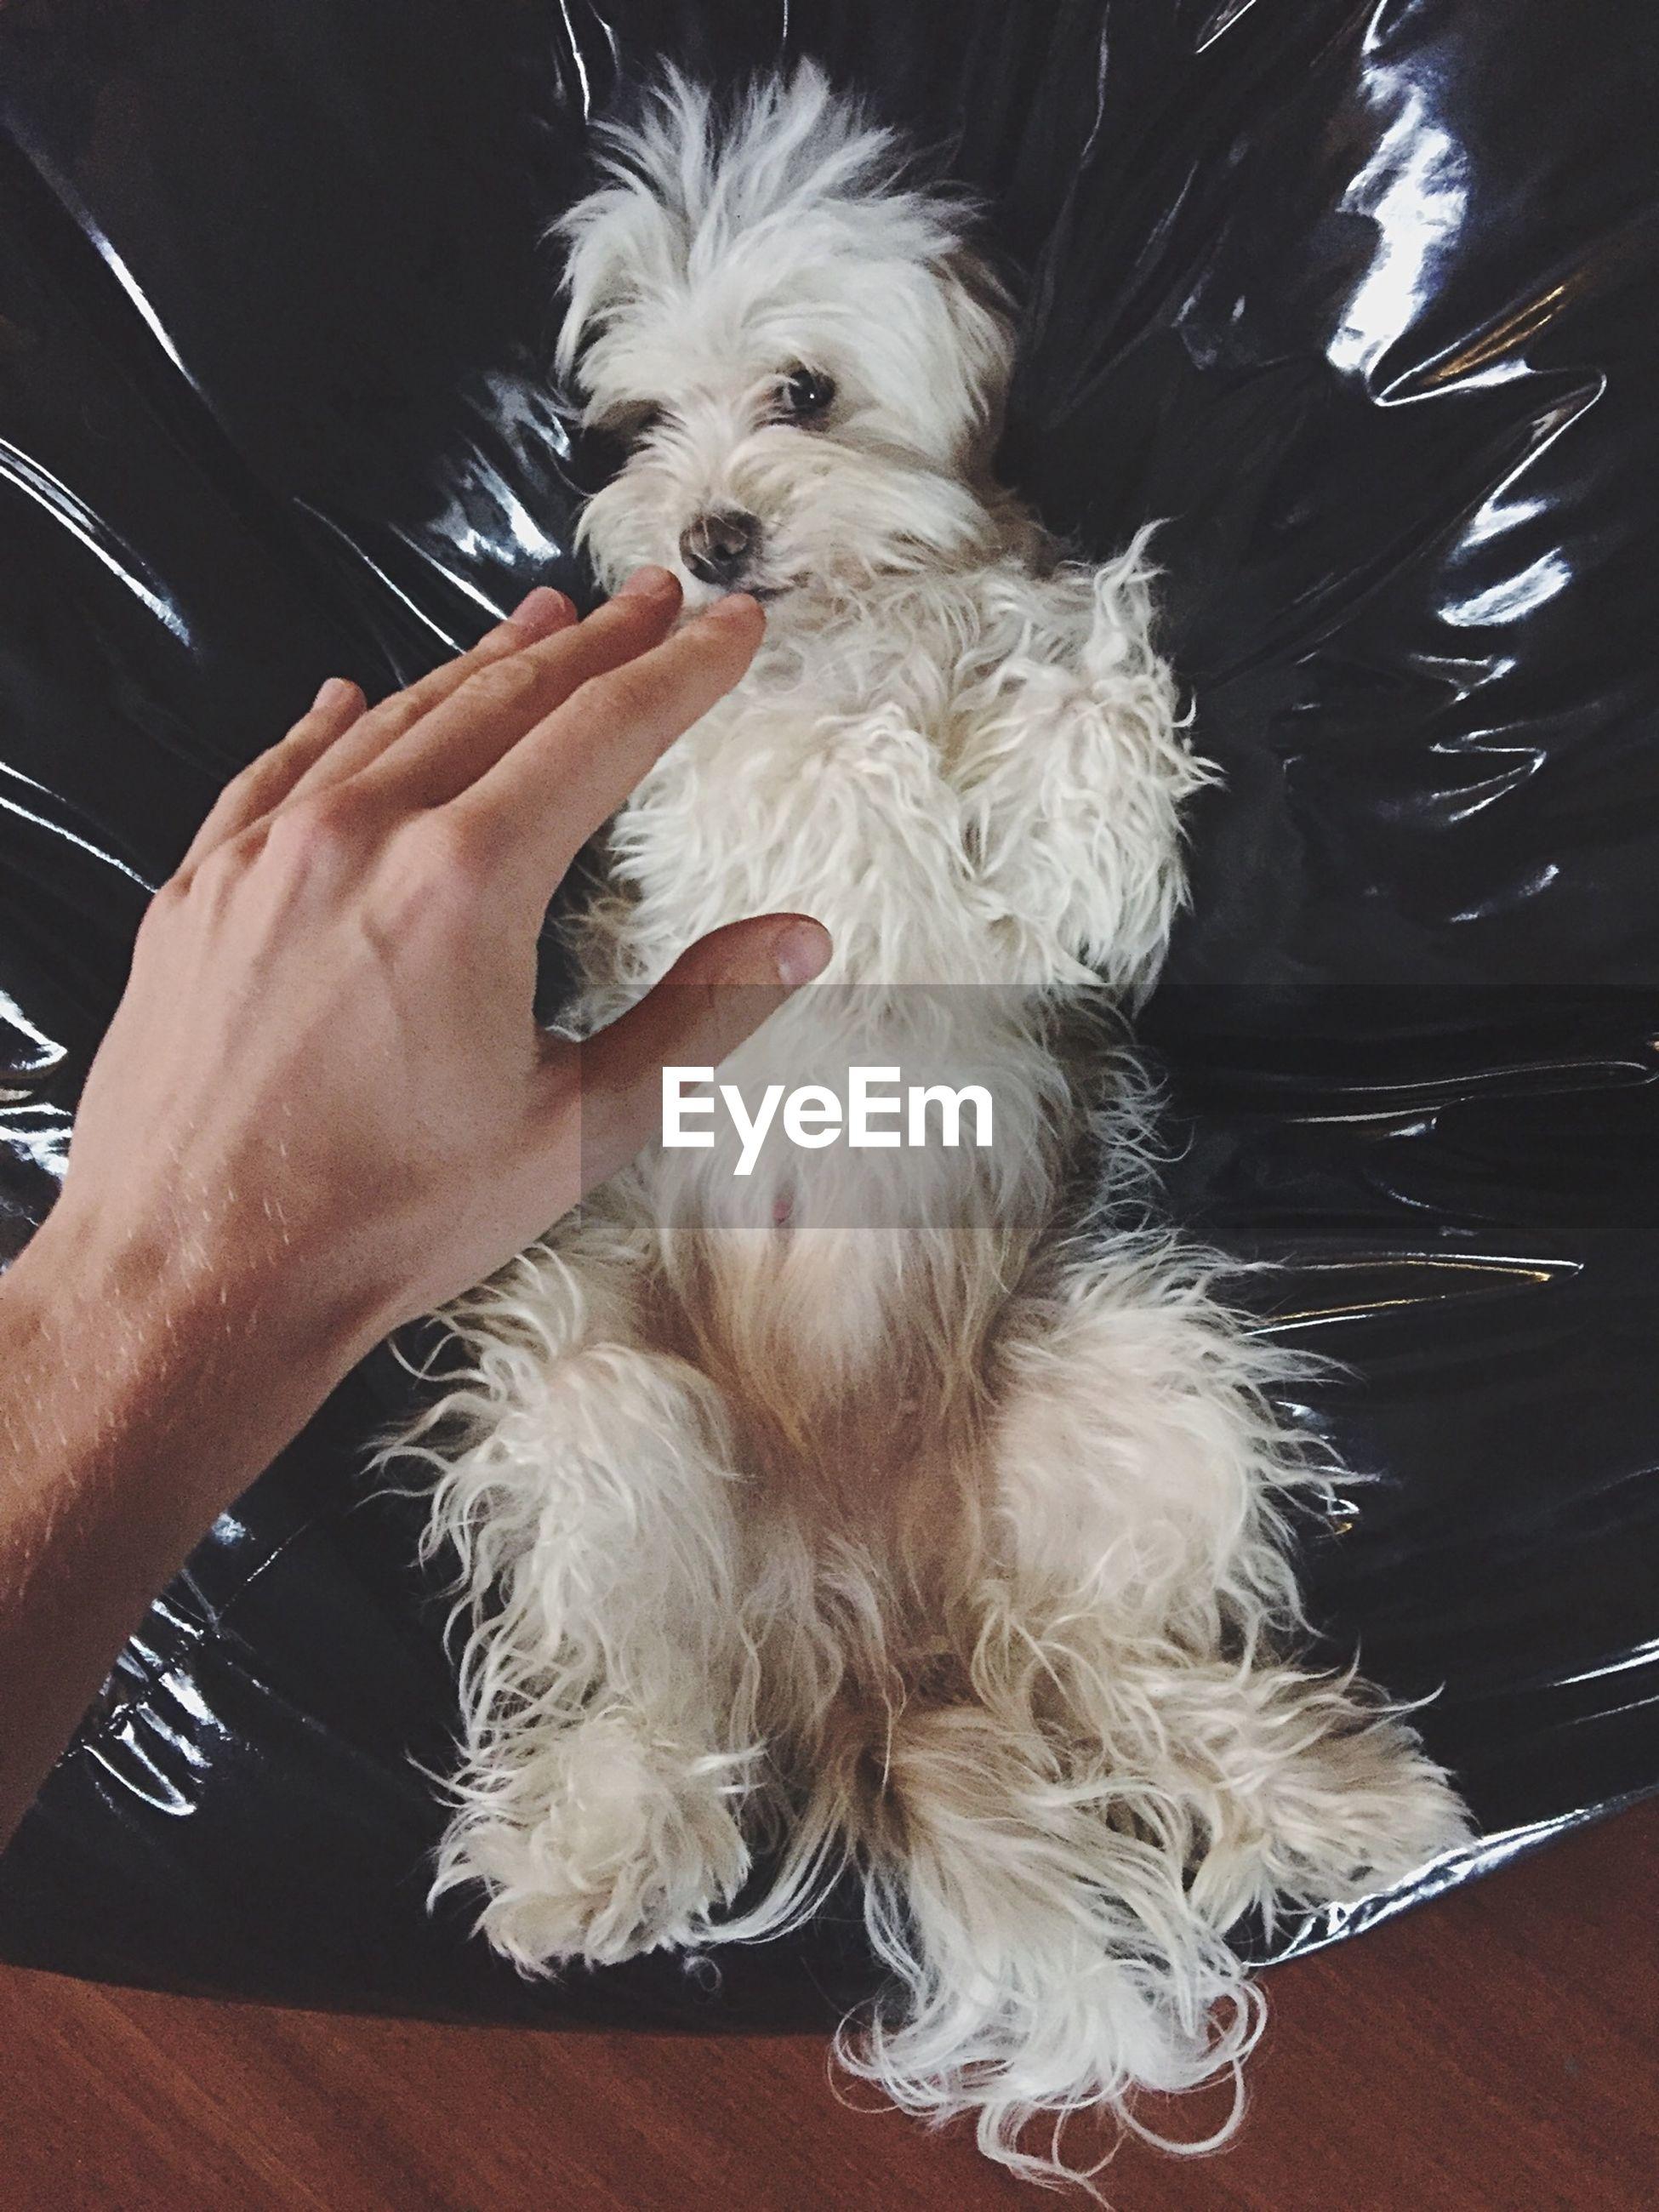 Close-up of hand touching dog